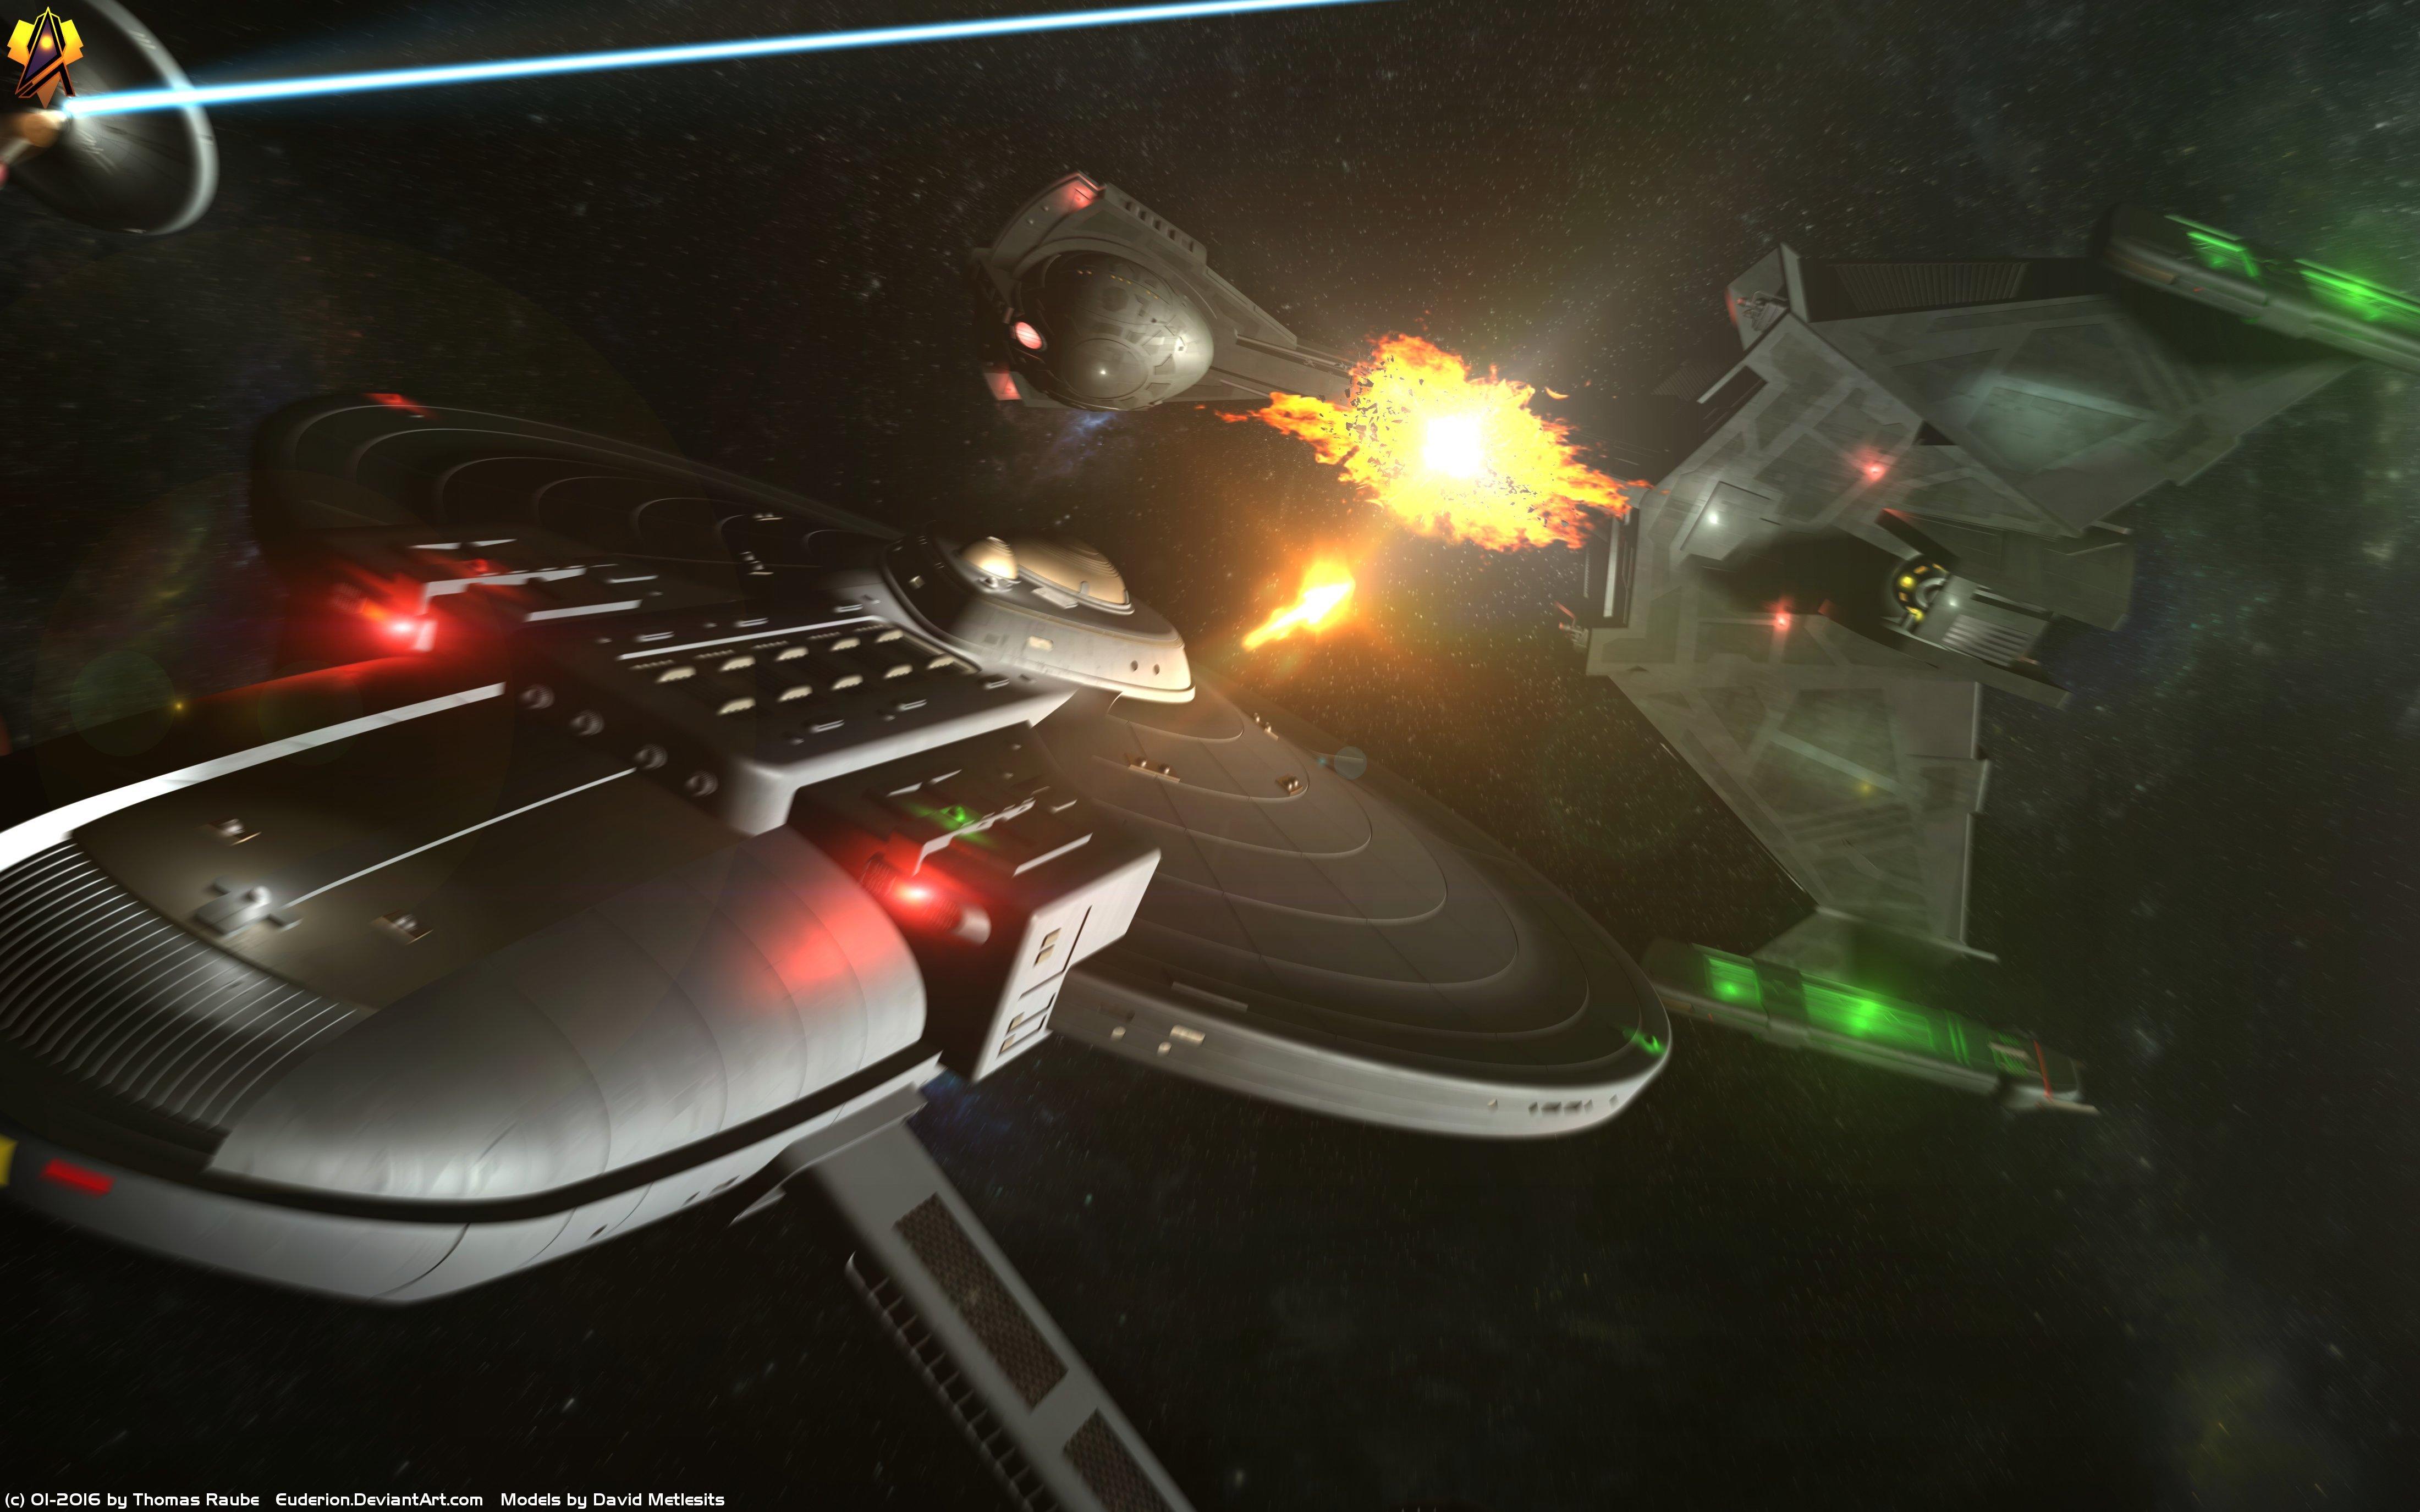 Like A Klingon Maneuver 4k Ultra Hd Wallpaper Background Image